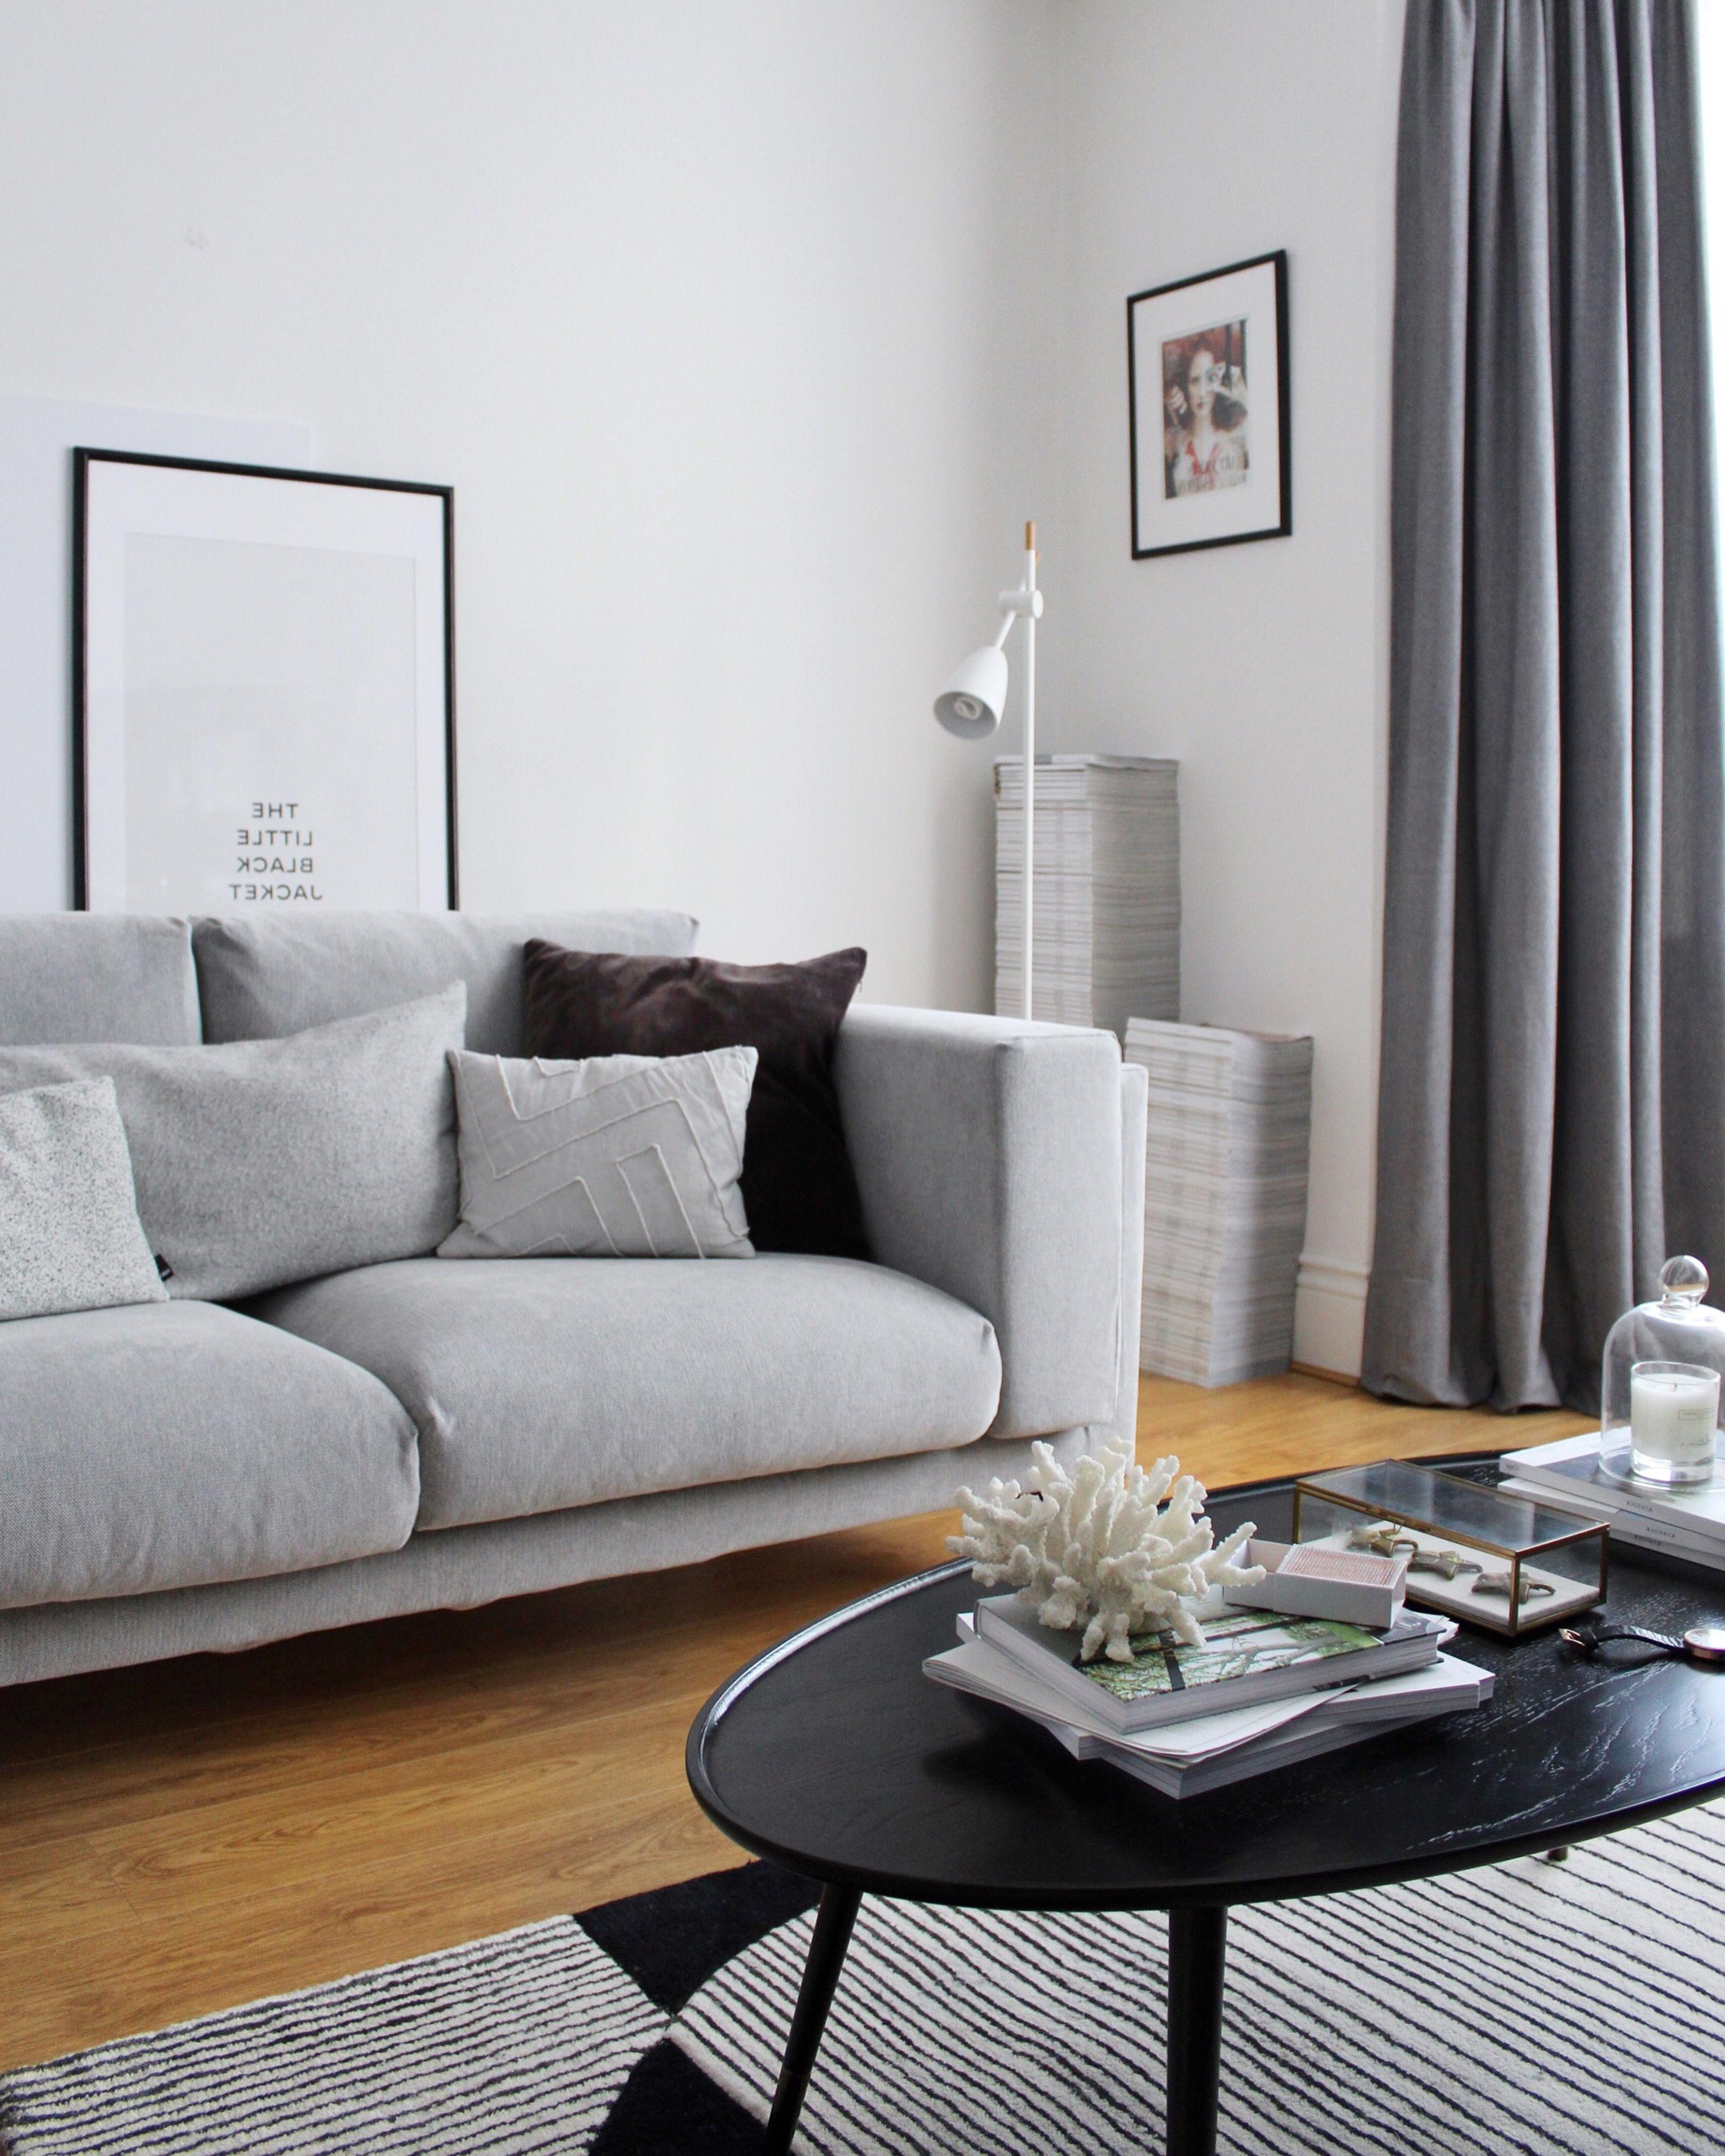 Sofa Nockeby Dwdk Living Room Update Part One the Ikea Nockeby sofa is In It S